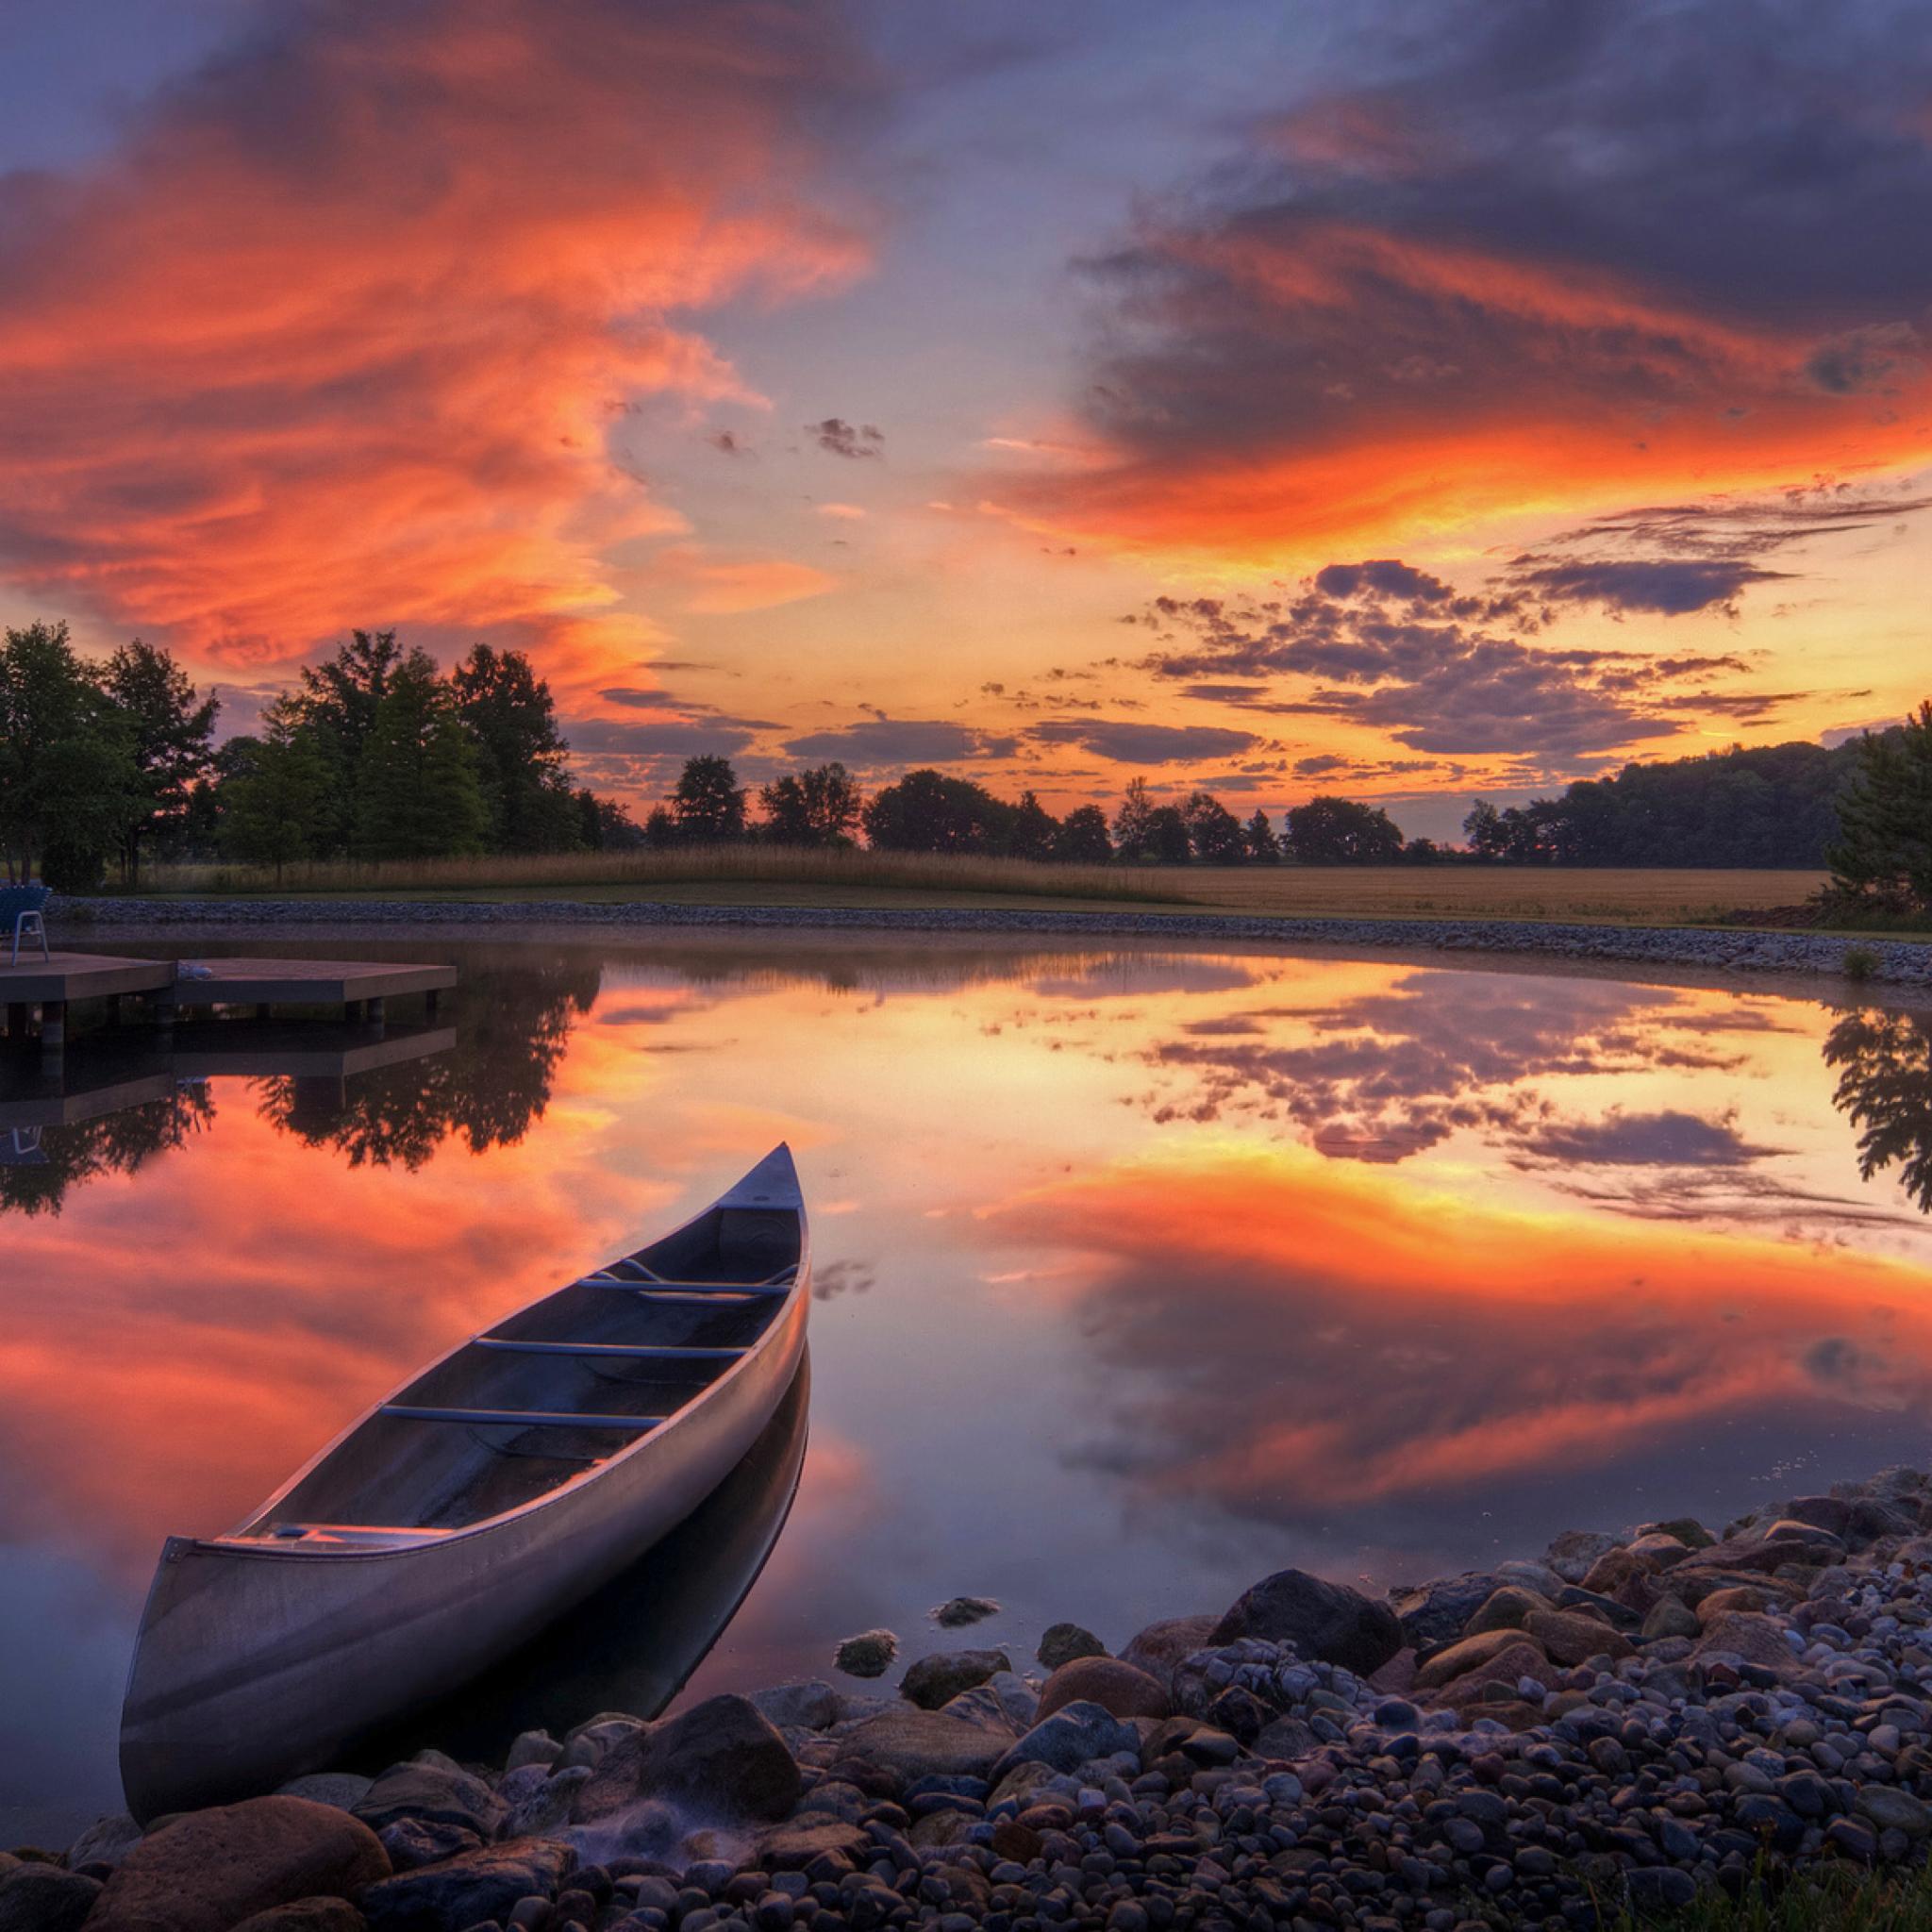 Canoe At Sunset Wallpaper For Ipad Mini 2